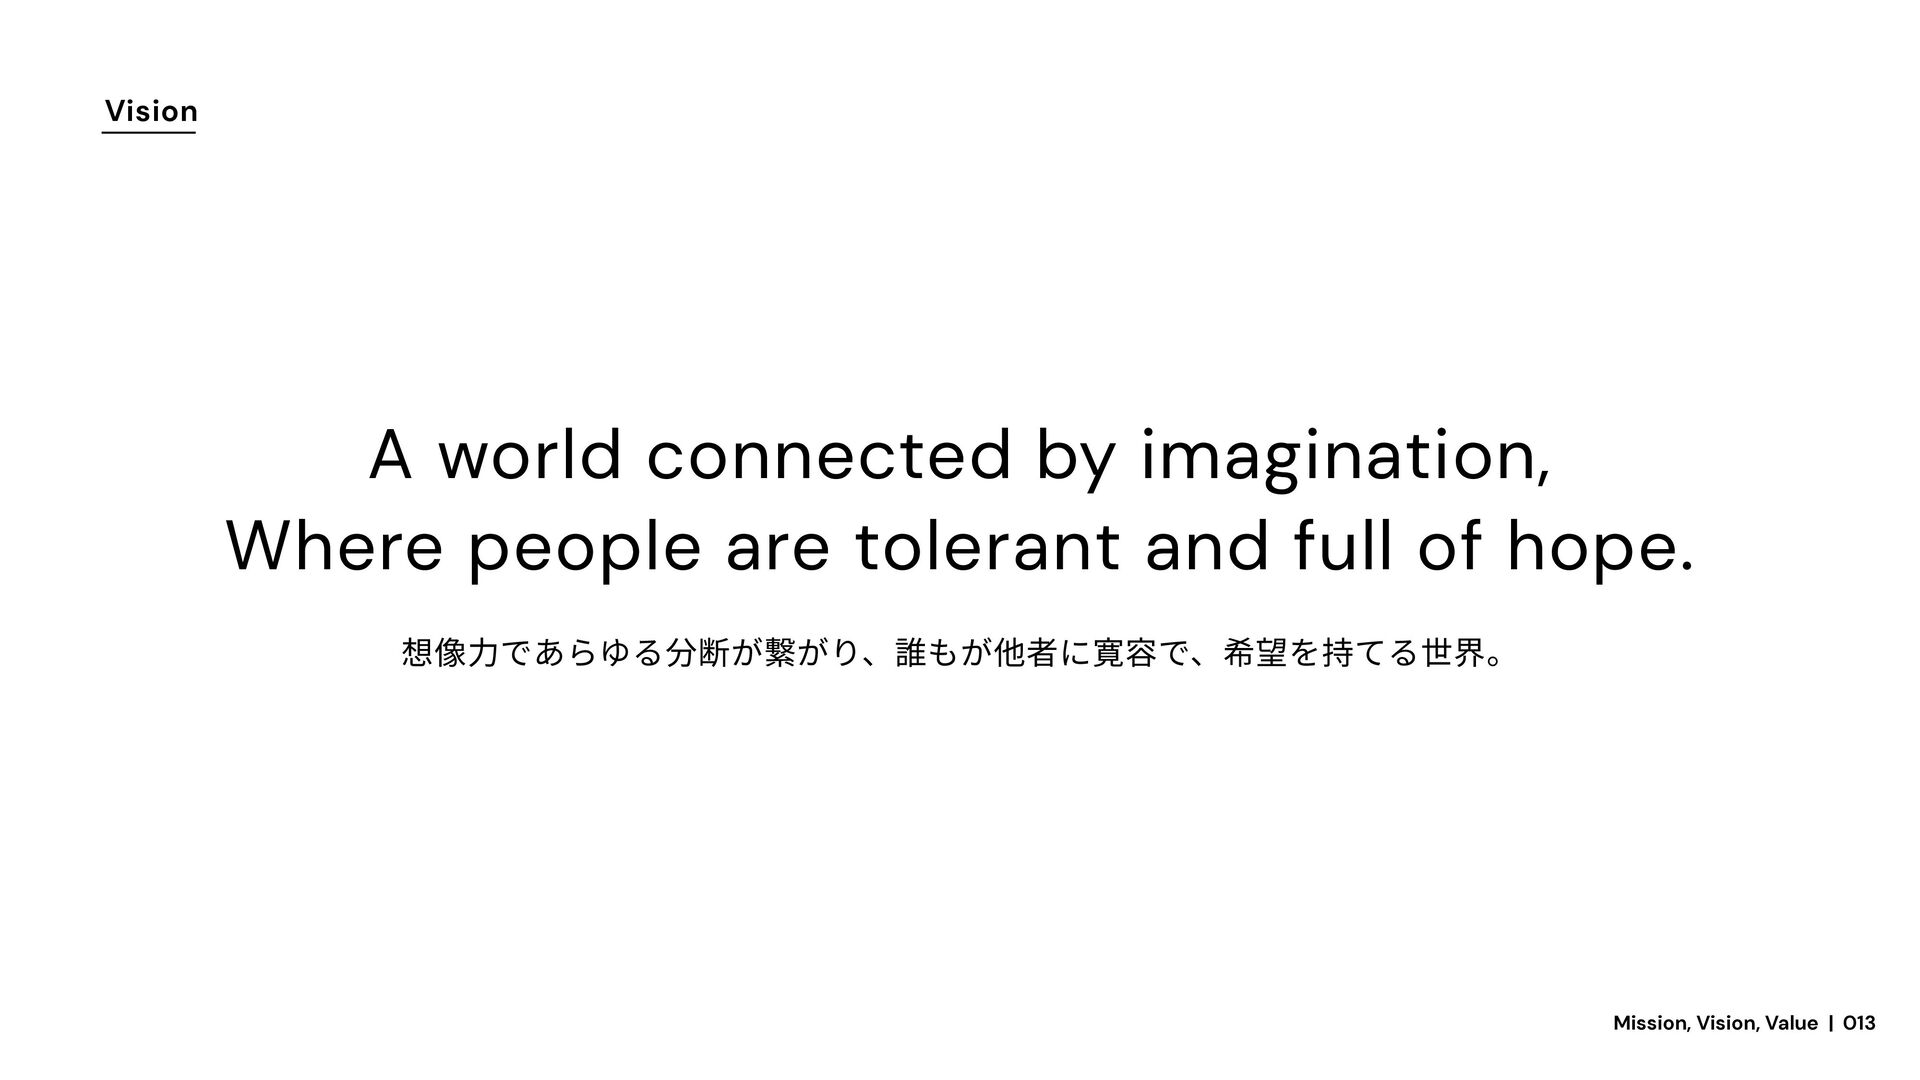 Mission, Vision, Value | 013 اۀʹ͓͚ΔʮόϦϡʔʯͱɺ ͦ...